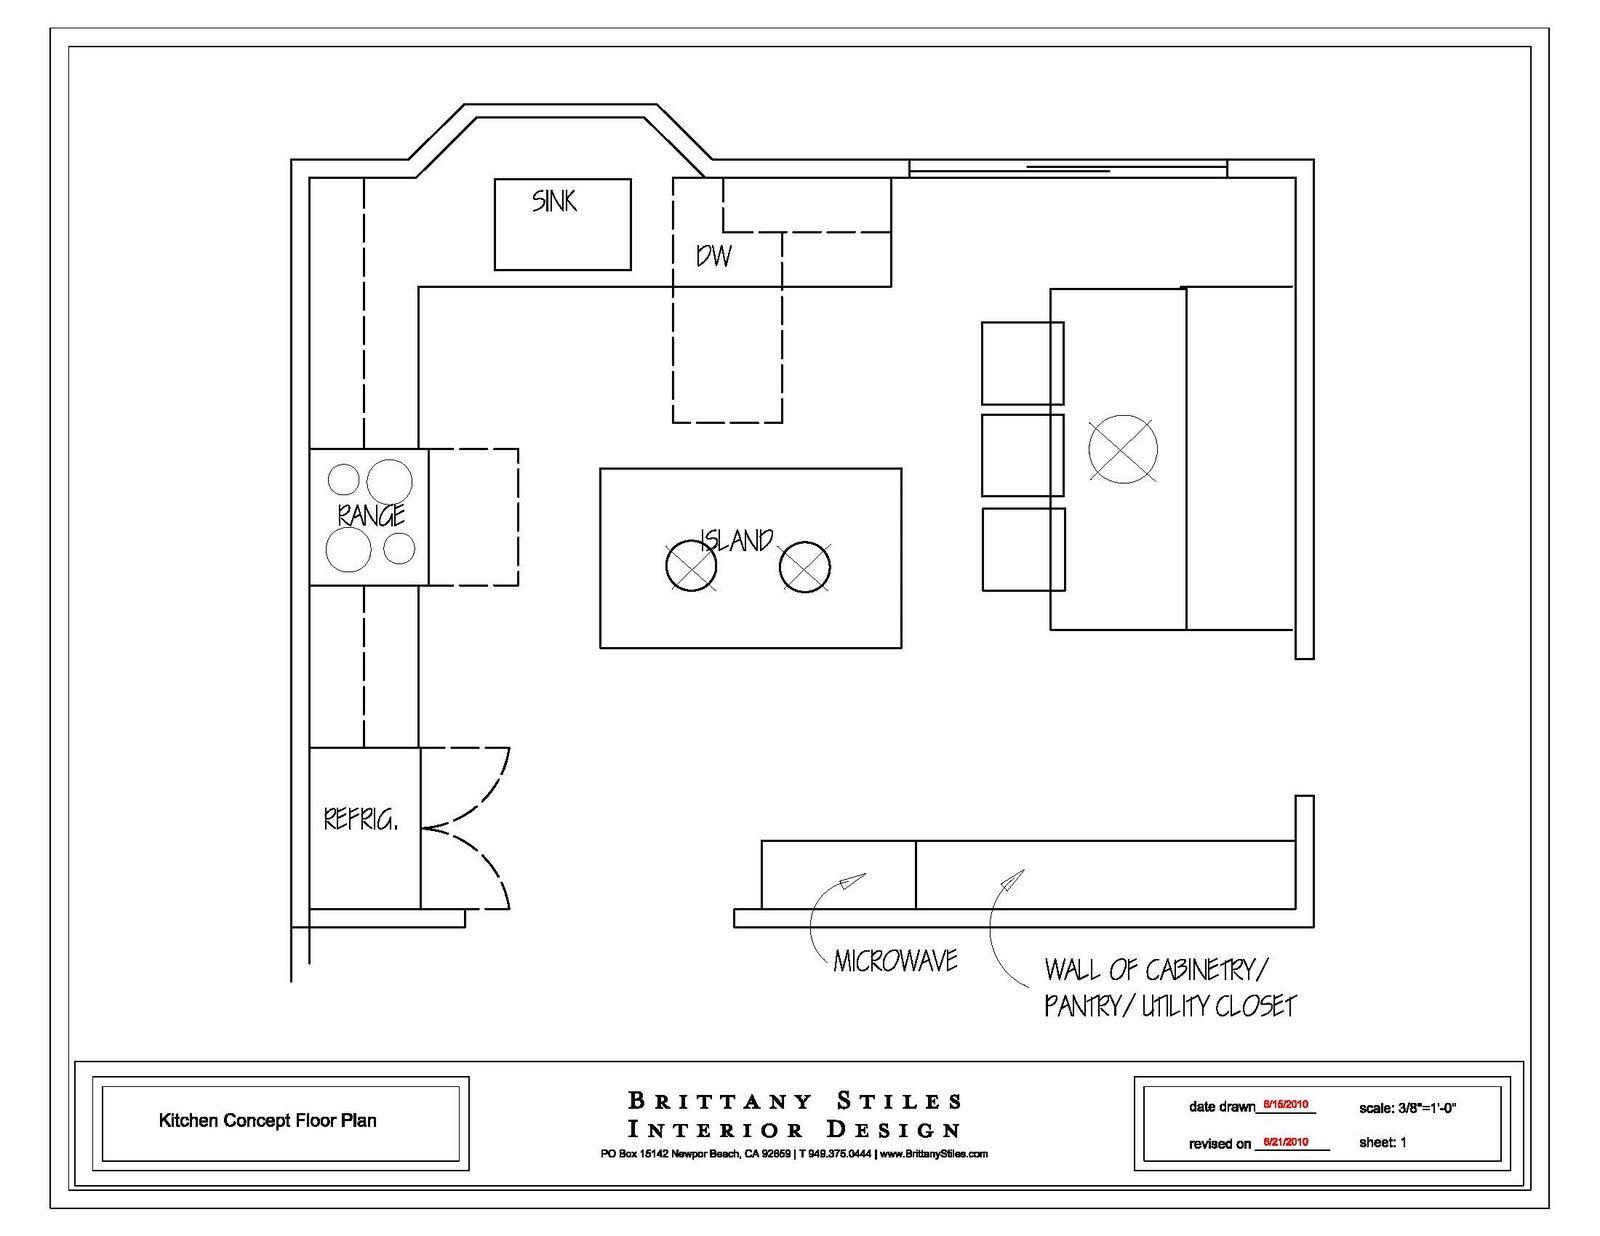 Kitchen Design Inspiration | Kitchens, Kitchen layout plans and ...